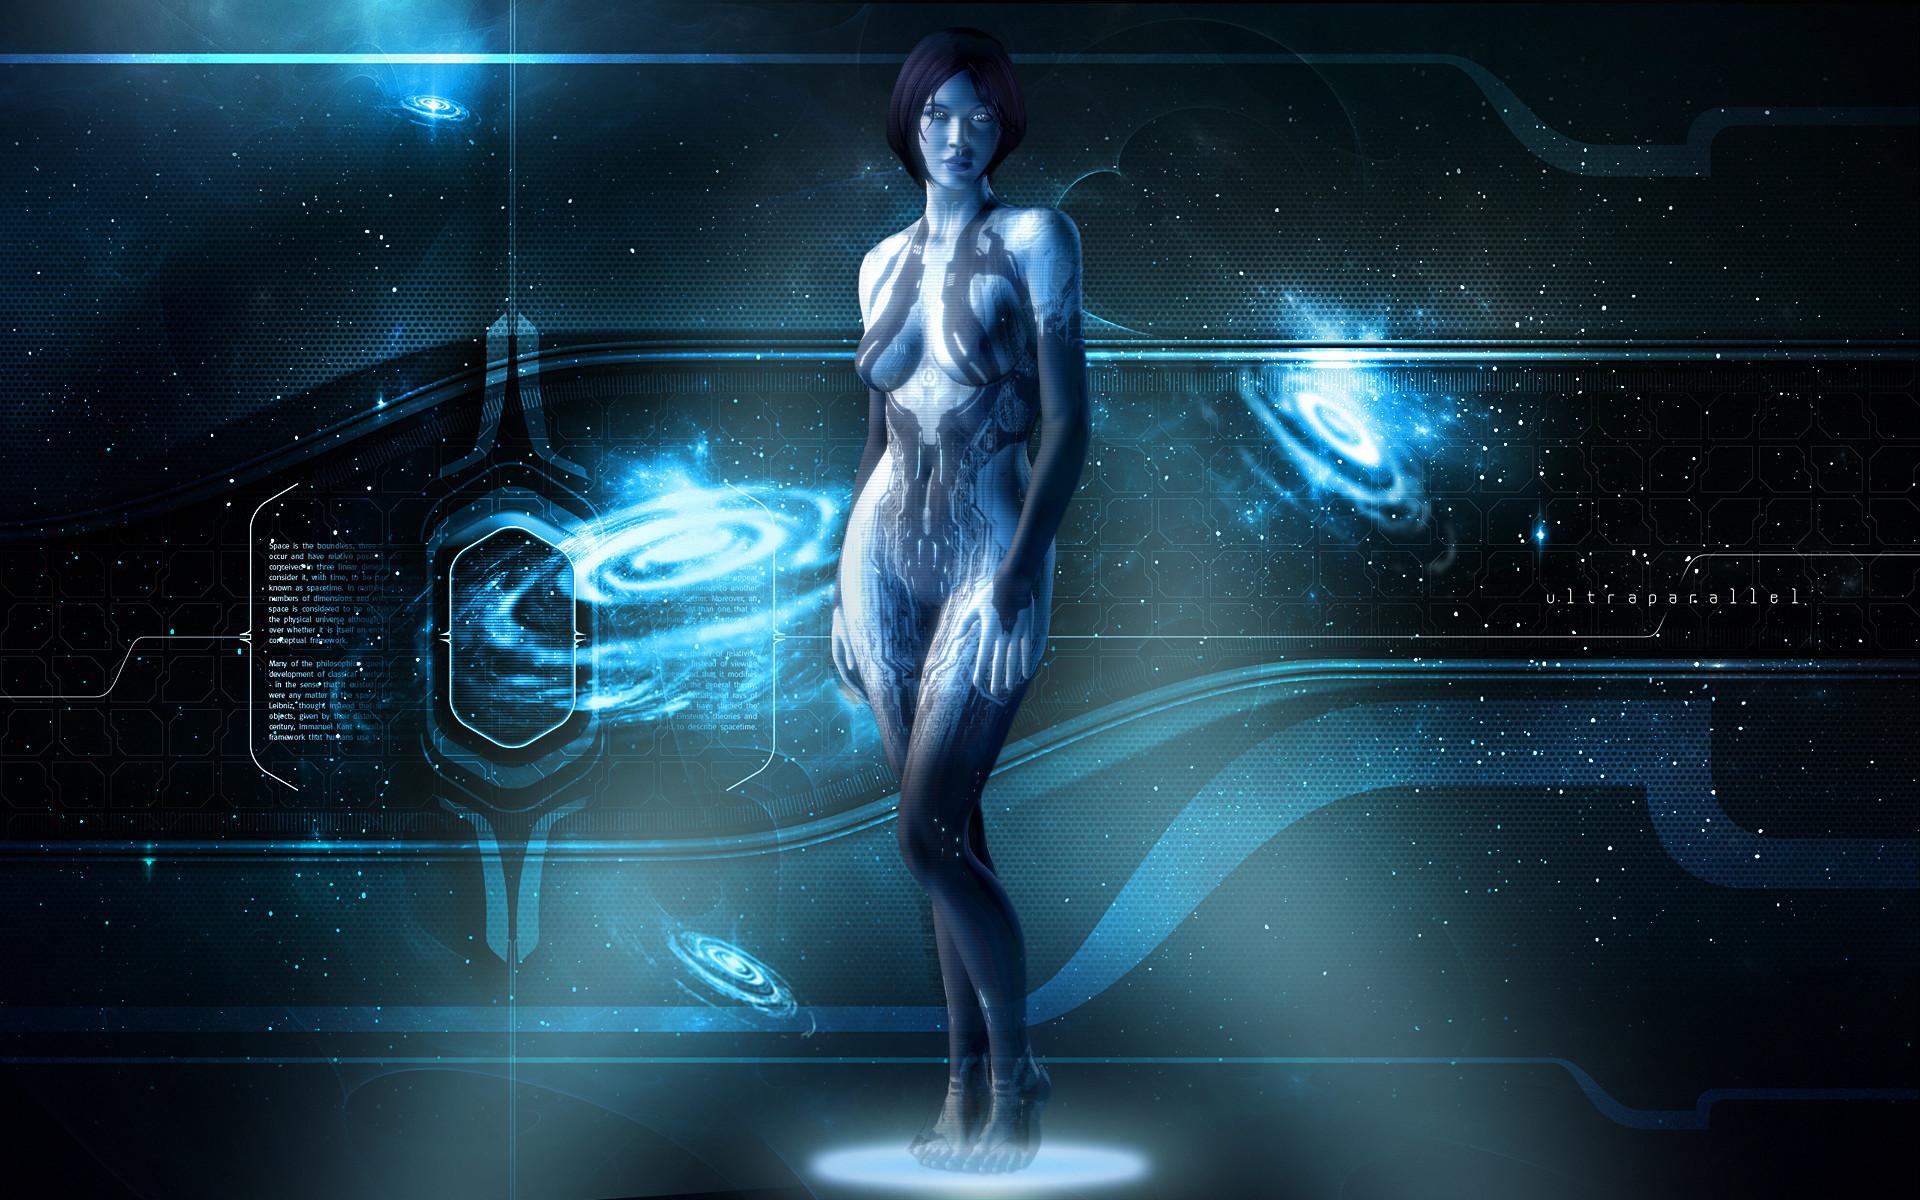 Cortana Animated Wallpaper Windows 10 71 images 1920x1200